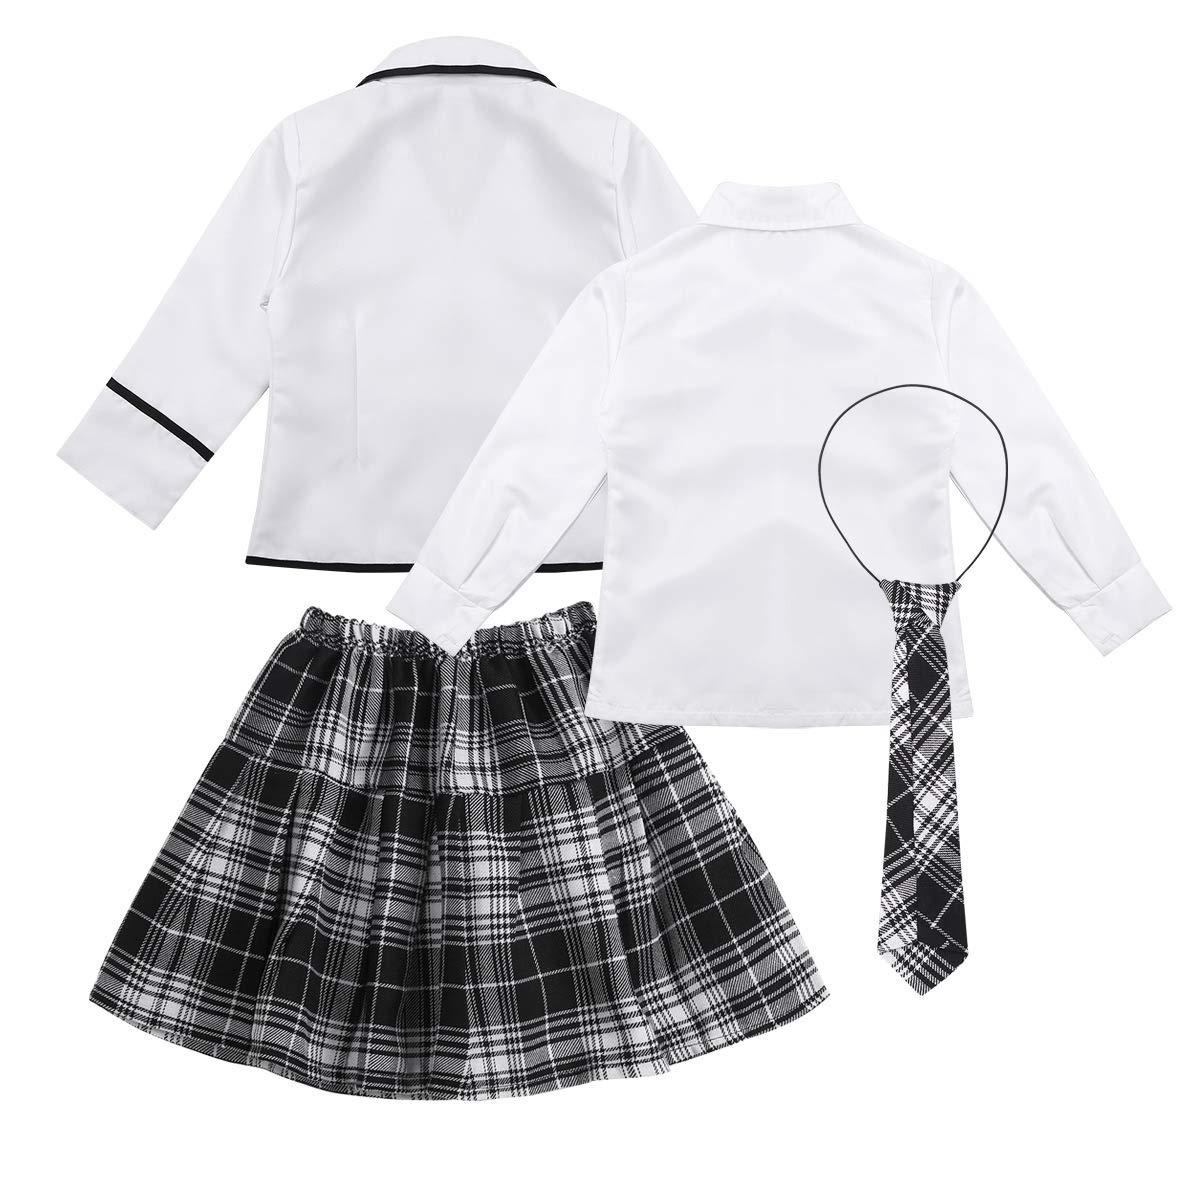 dPois Disfraz Colegiala Niña Uniforme Escolar Japones Camisa Manga ...